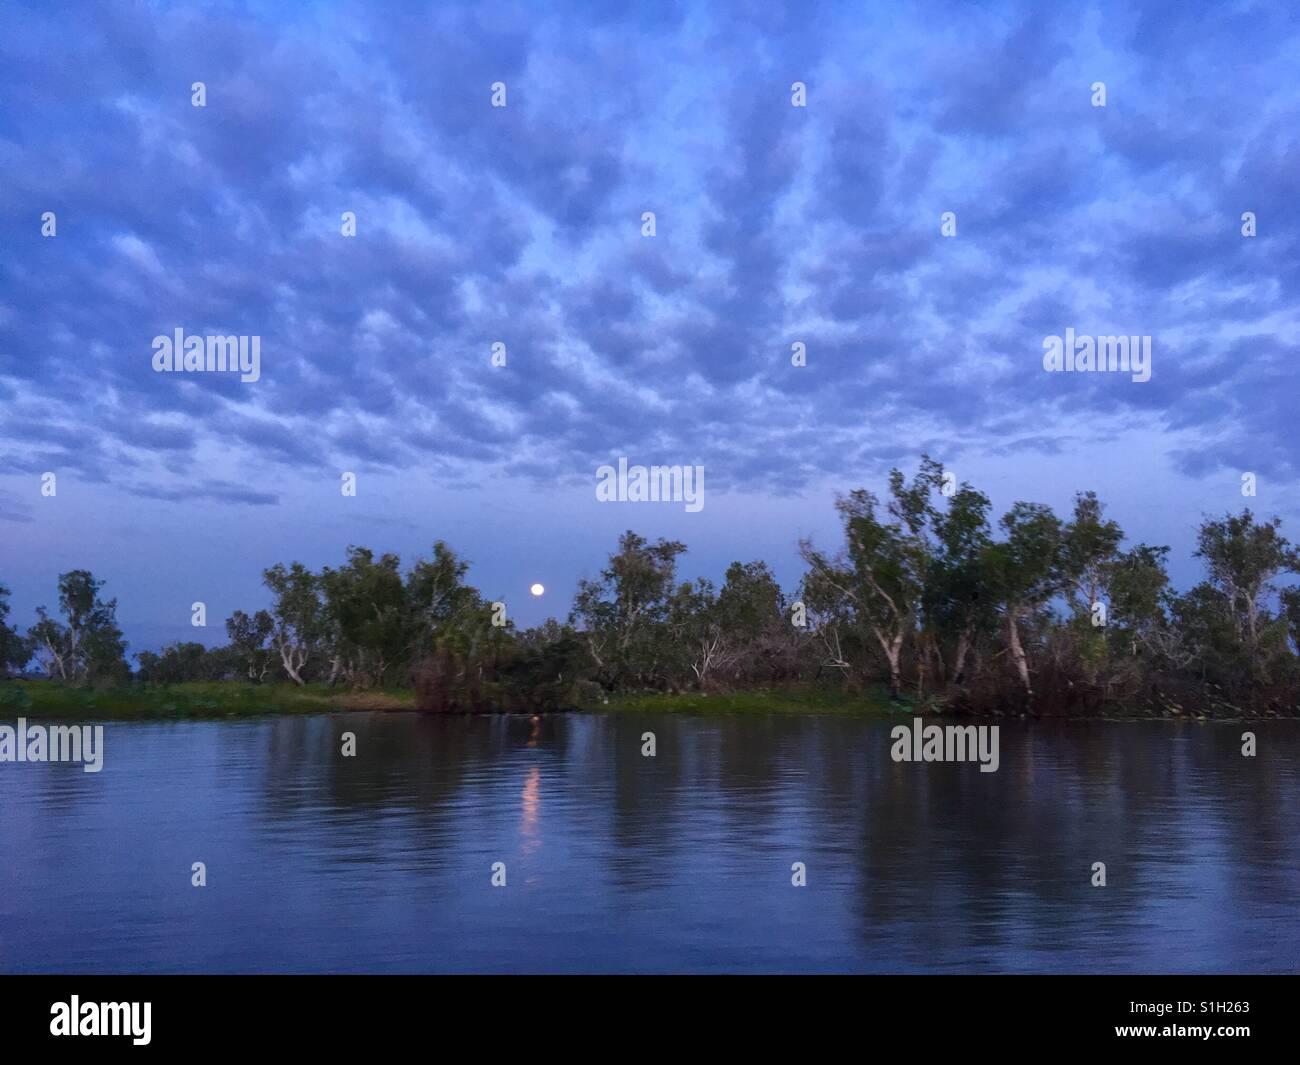 Full moon over Corroboree Billabong, near Darwin in the Northern Territory of Australia. - Stock Image